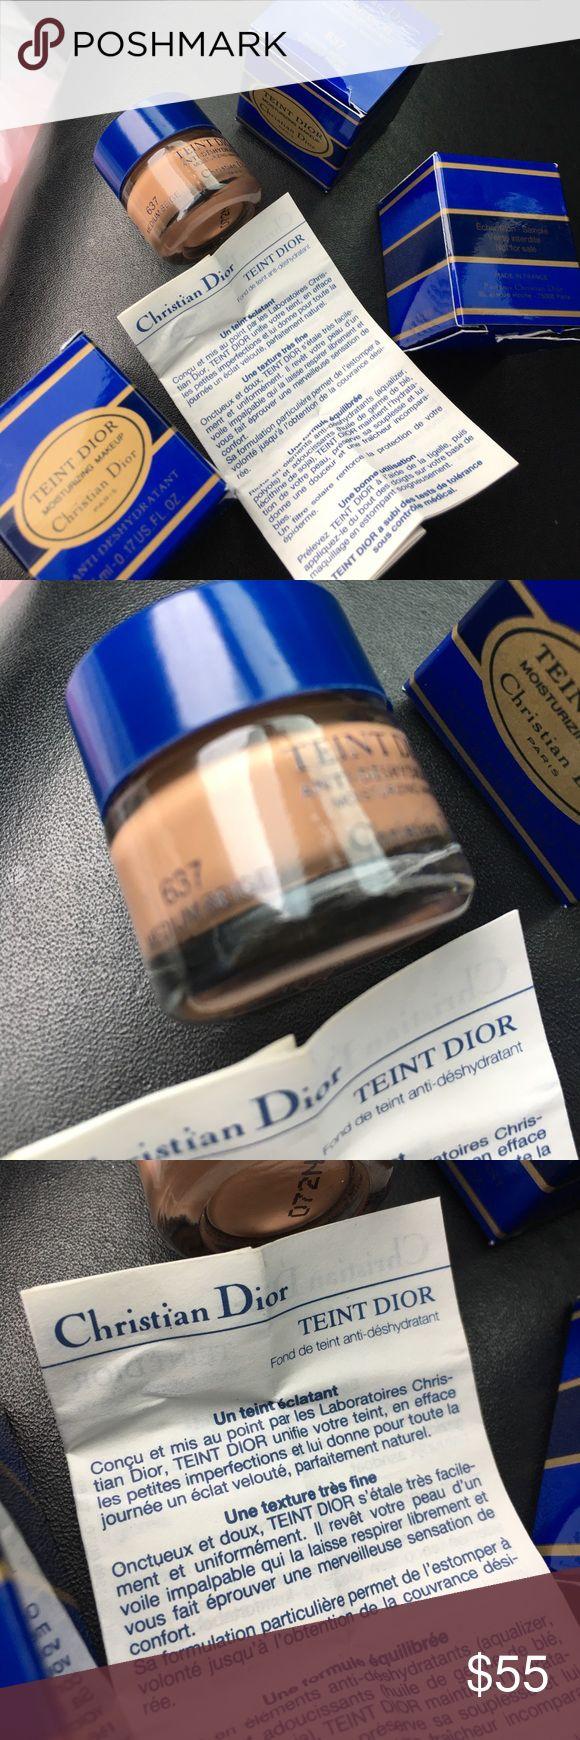 П��christian Dior Teint Dior Makeup #637💄 5 Total Sample Size Christian Dior  Foundations